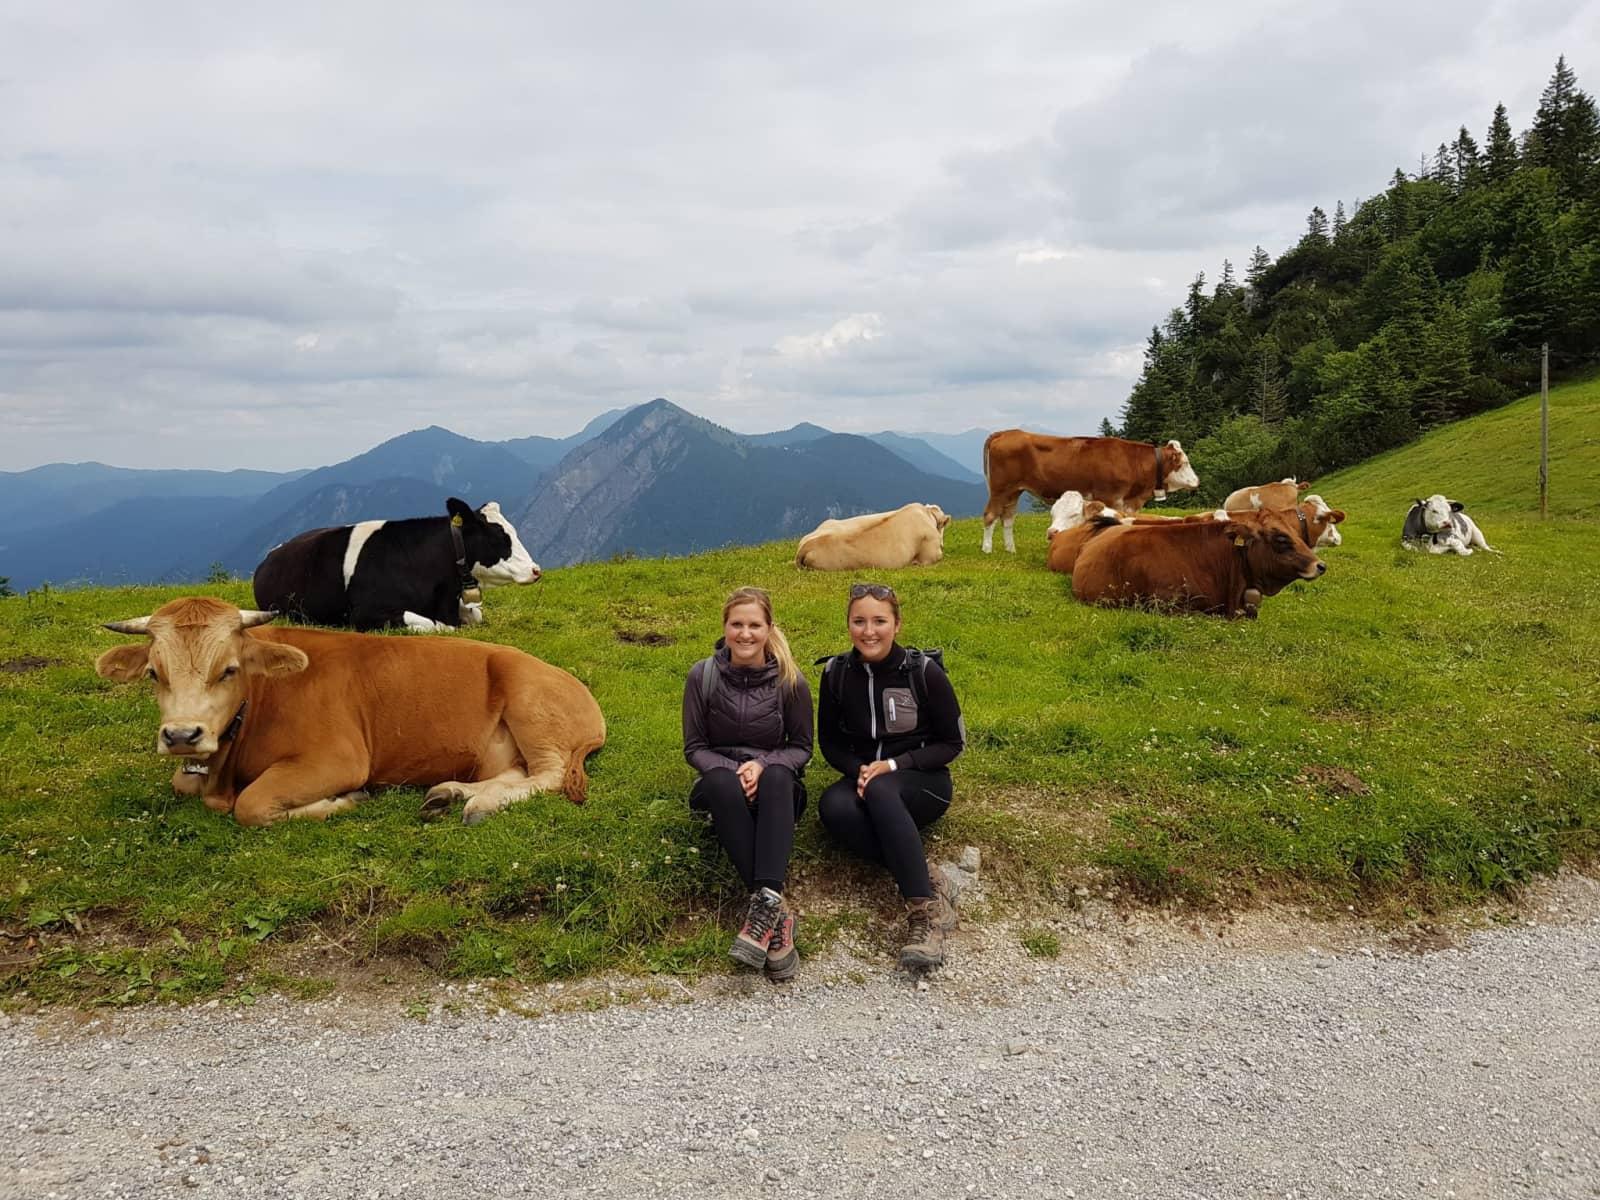 Christina & Anna-chiara from Munich, Germany